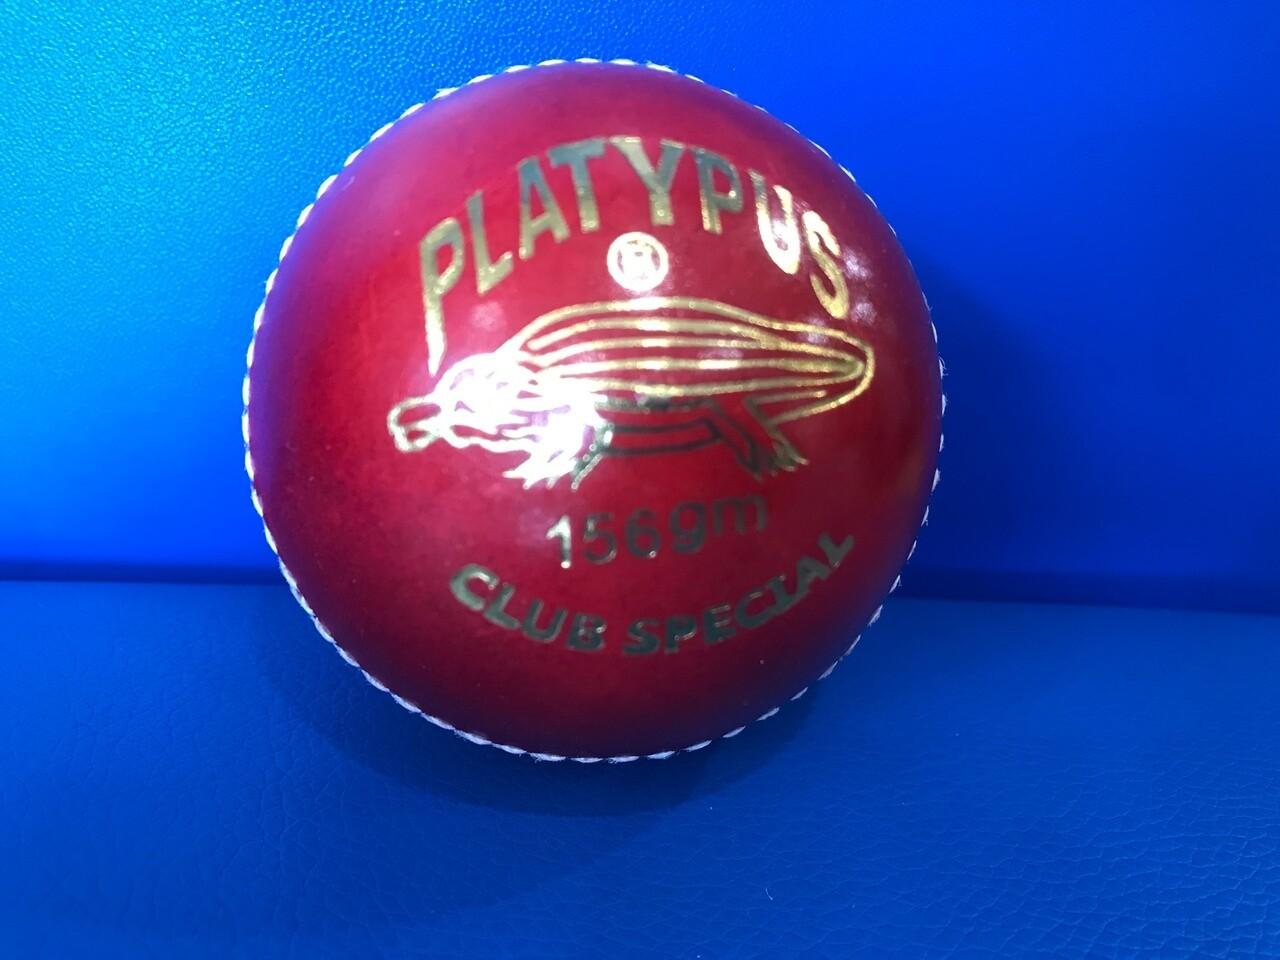 Platypus Cricket Ball (New) (EC825)